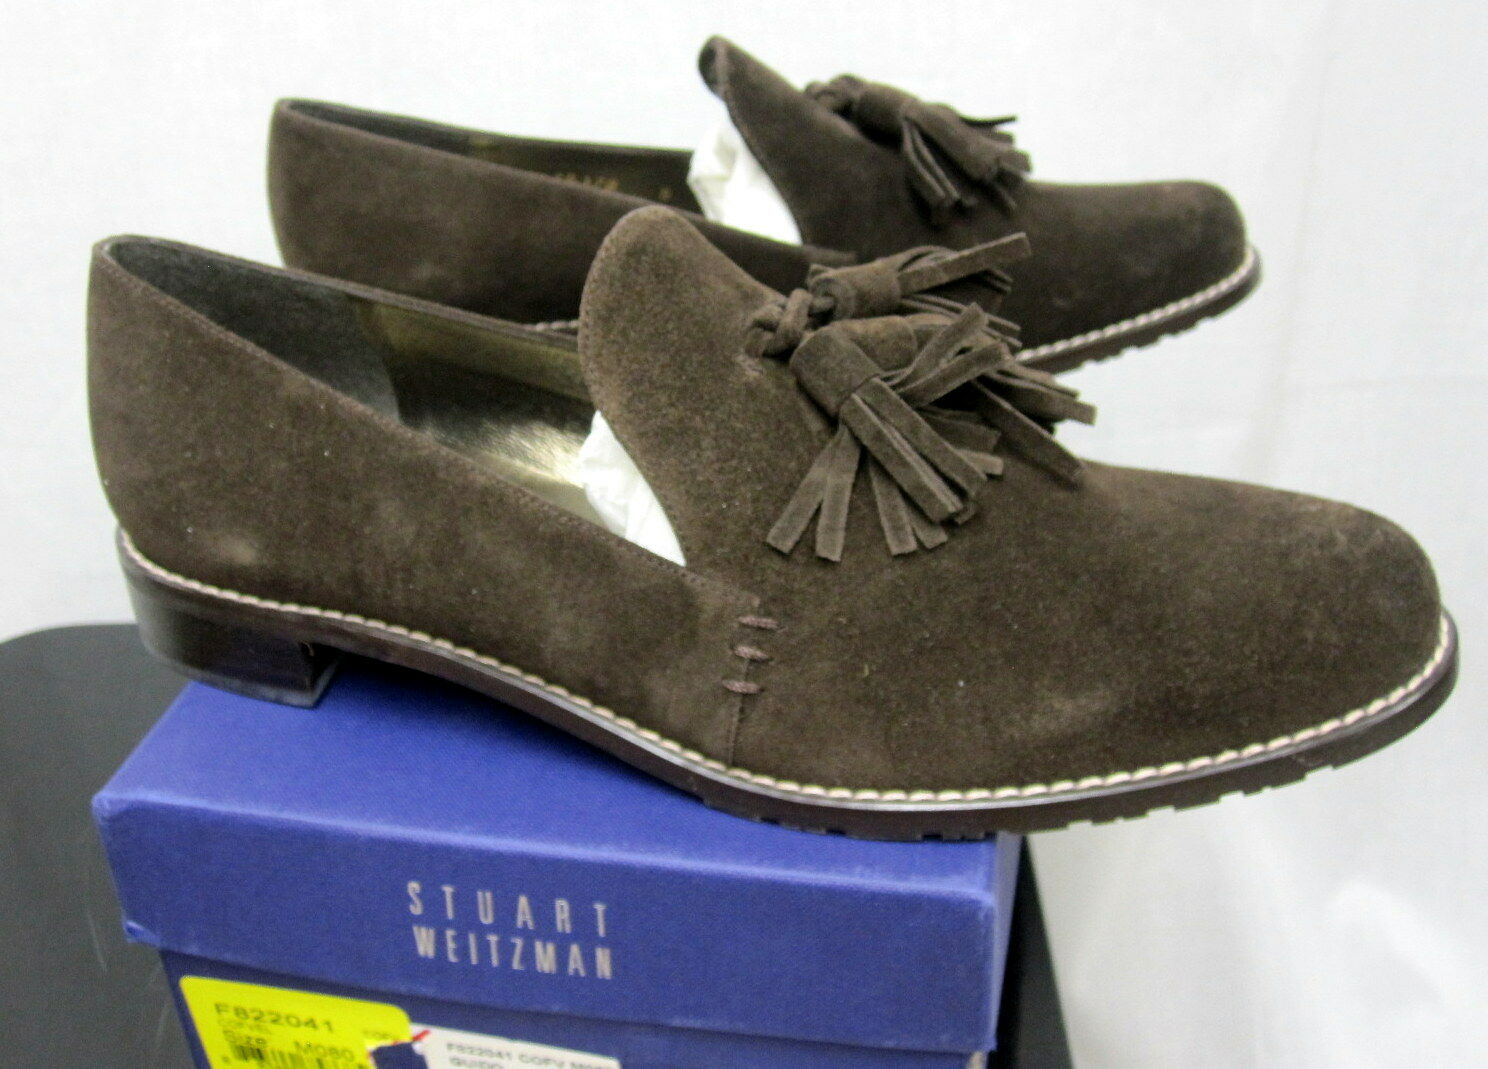 Stuart Weitzman Nuevo Con Etiquetas Y Caja Vel Café Vel Caja gamuza marrón zapatos España Talla 8 Rt 365 cab72c